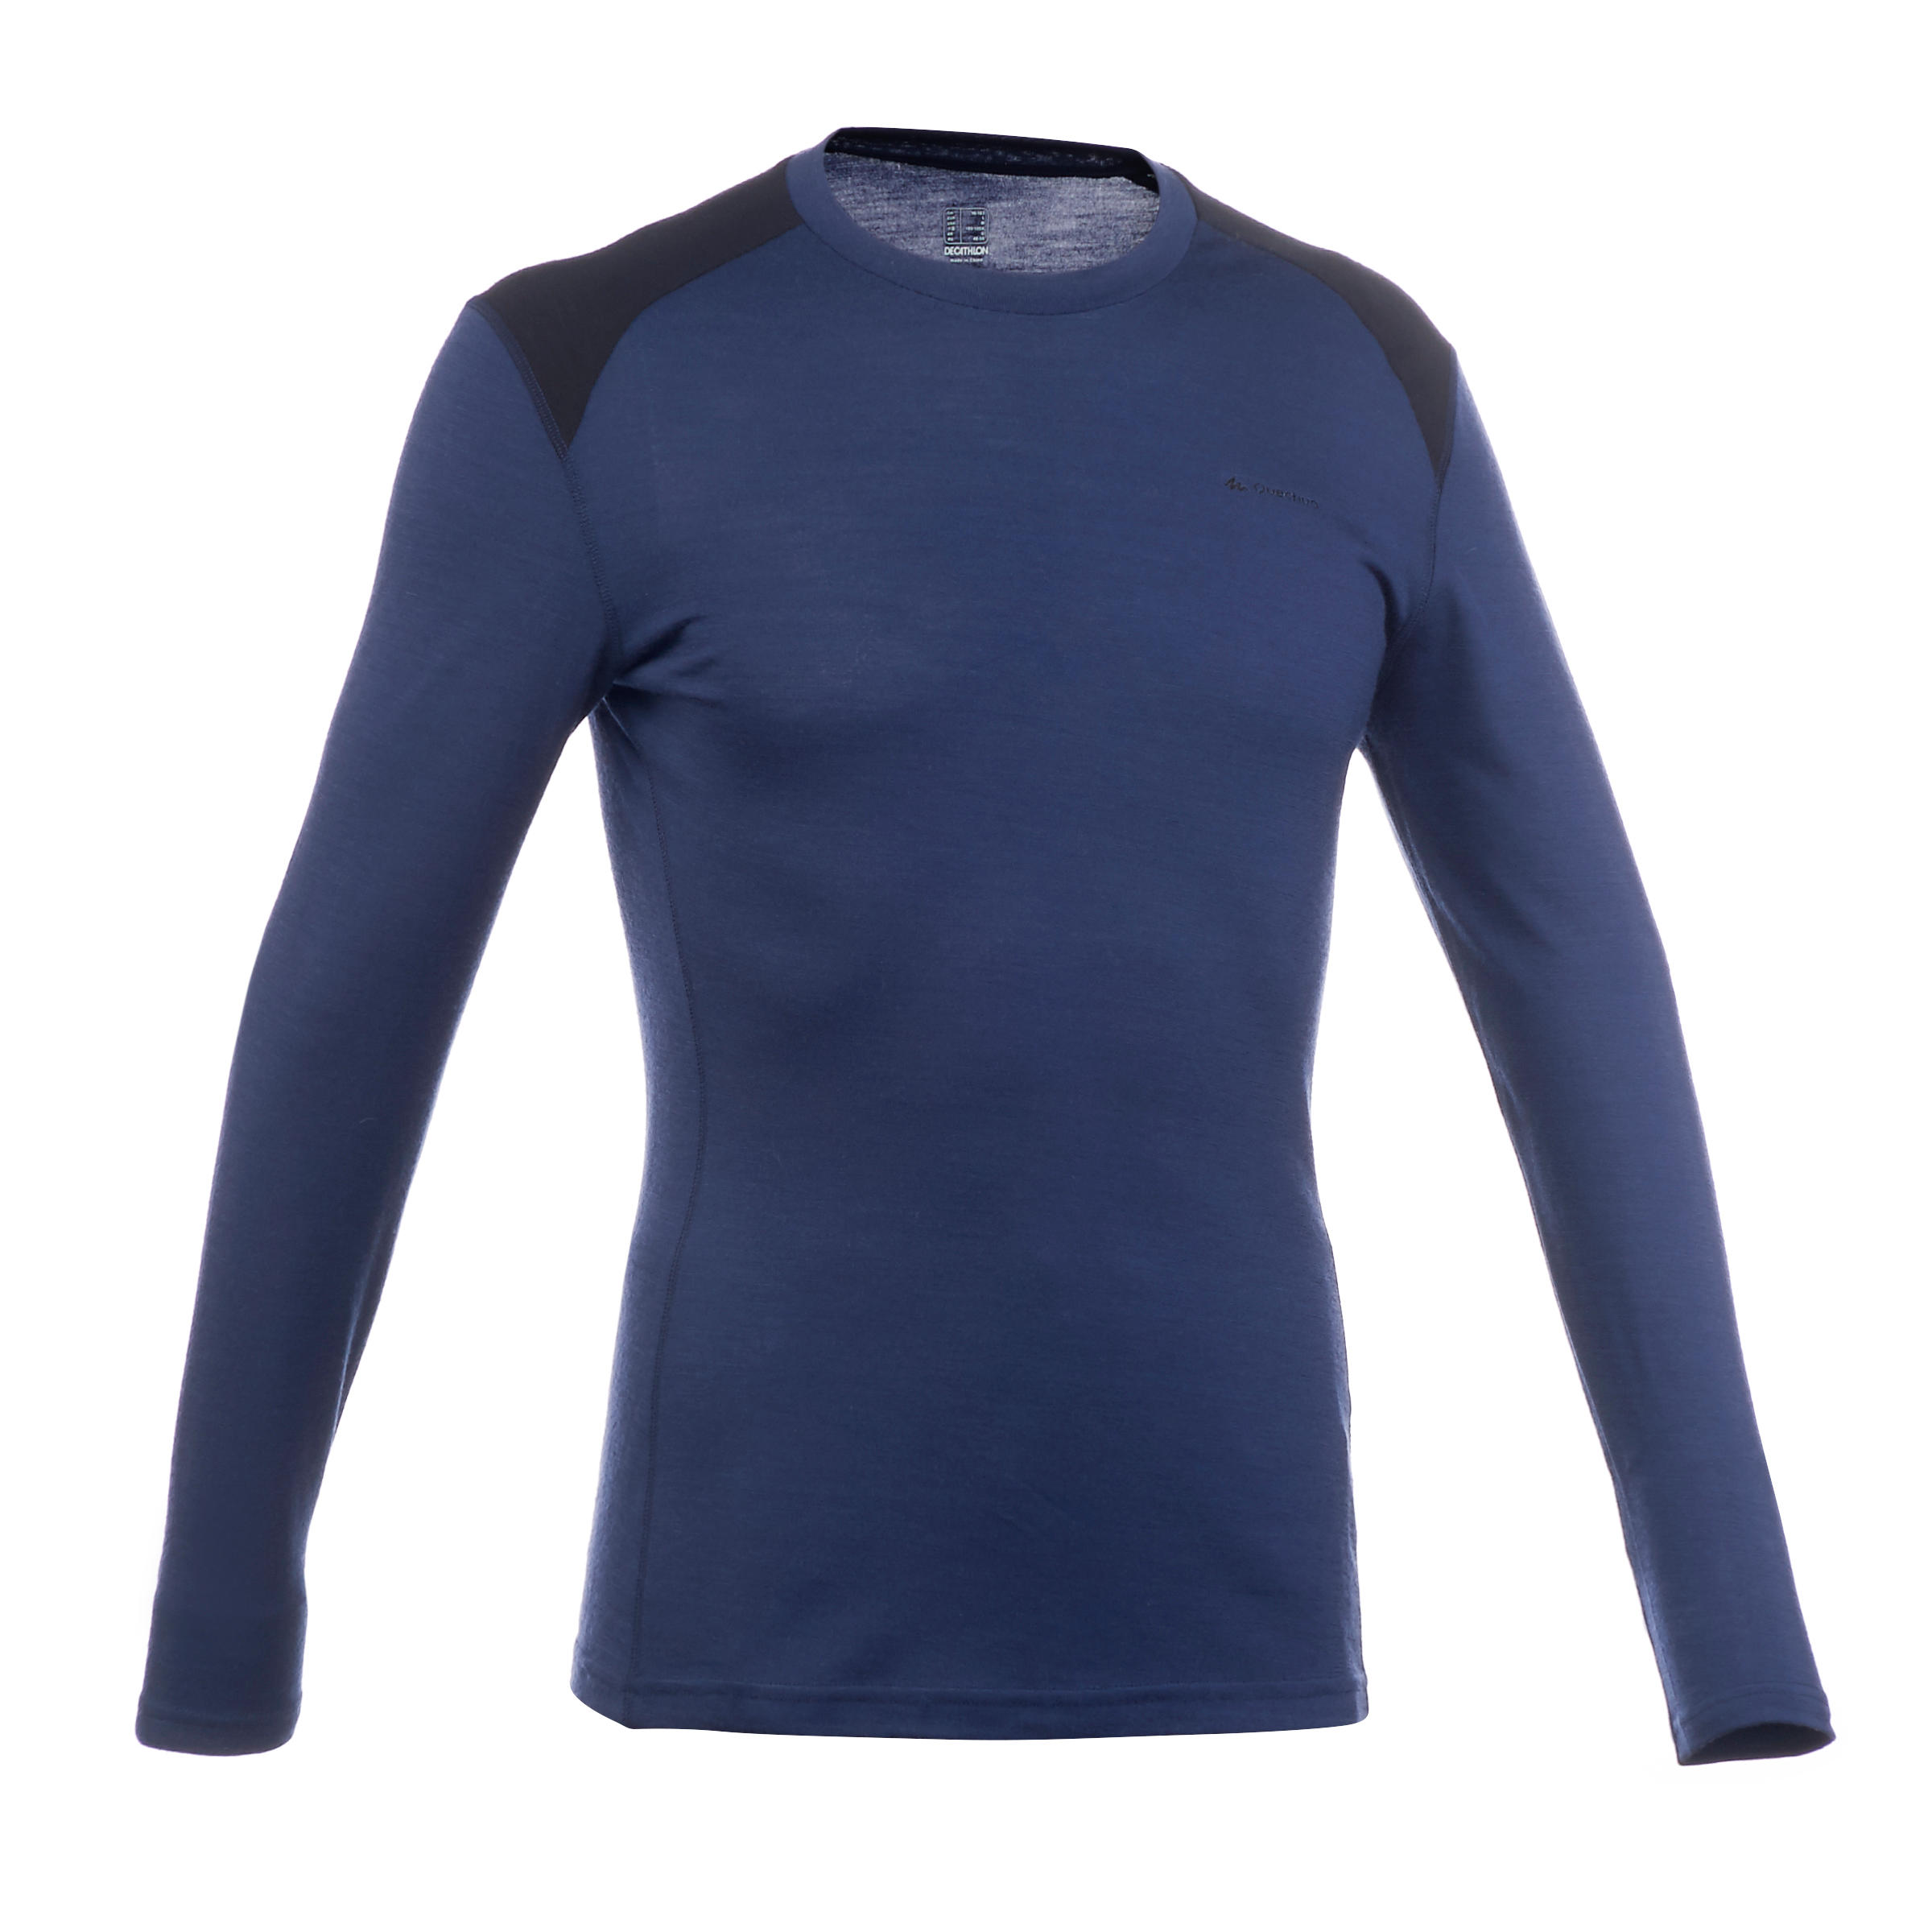 TechWOOL 190 Men's Long-sleeved Trekking Shirt - Navy Blue